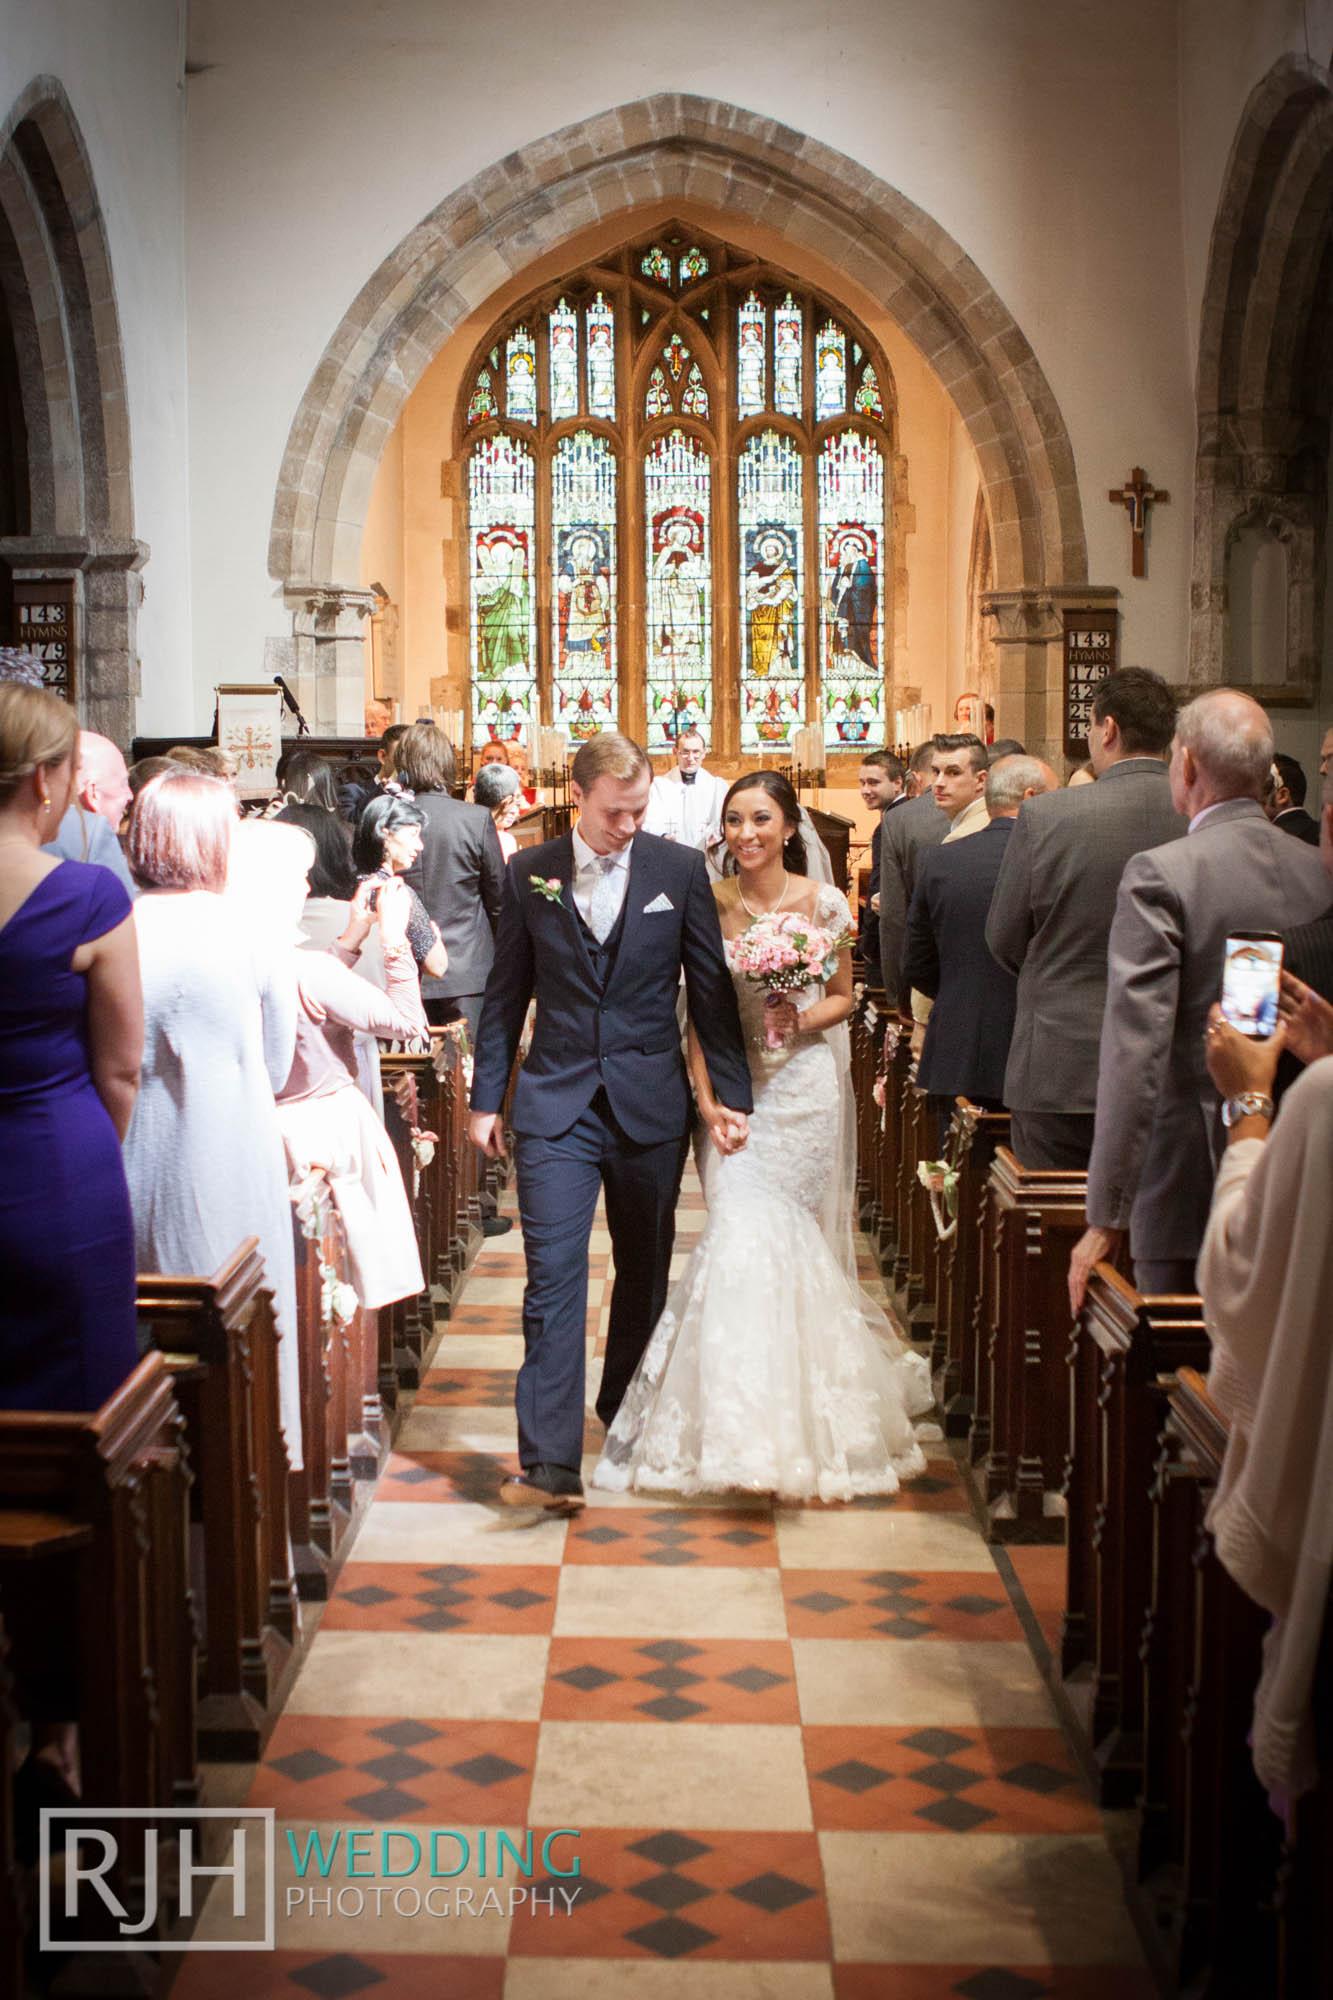 RJH Wedding Photography_Tankersley Manor Wedding_25.jpg